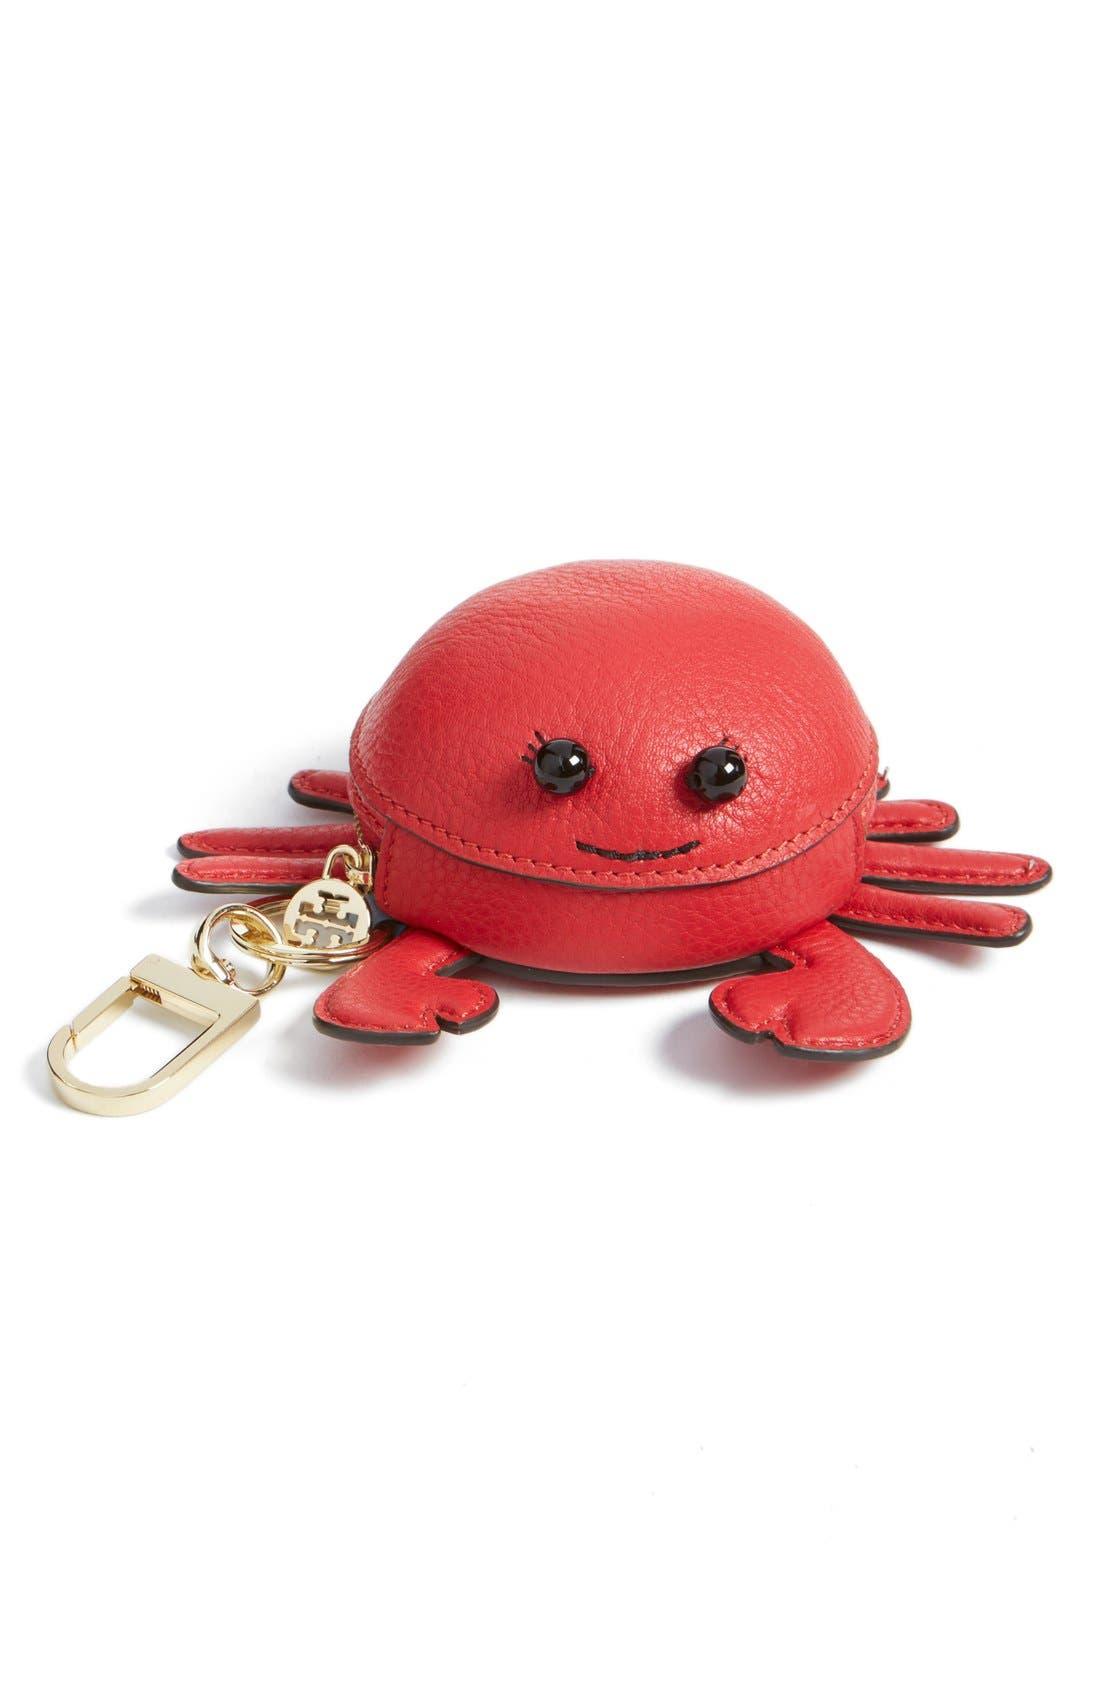 Main Image - Tory Burch 'Carl Crab' Coin Pouch Bag Charm